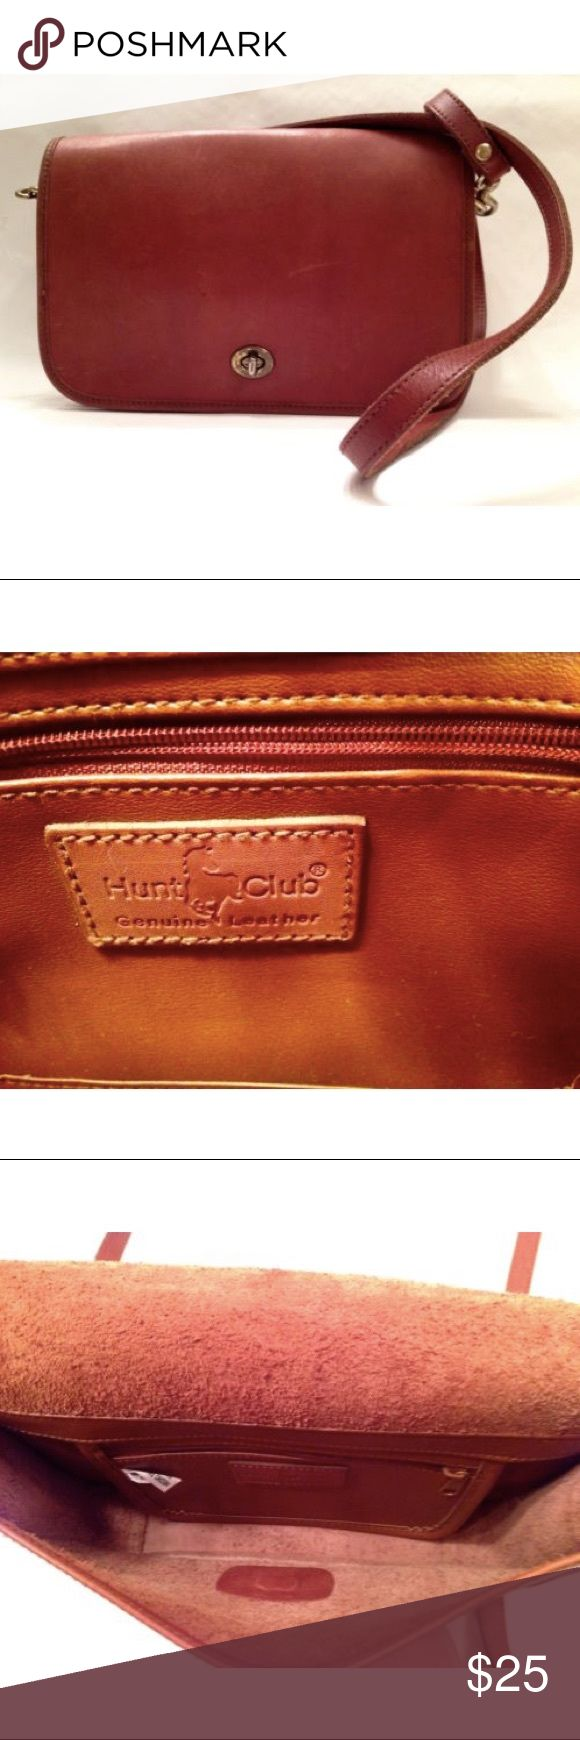 "Hunt Club All Leather Medium Cross Body Handbag Inside zip pocket. H: 7"", W: 10"", D: 2 1/2"". Shows slight wear from normal use. Hunt Club Bags Crossbody Bags"